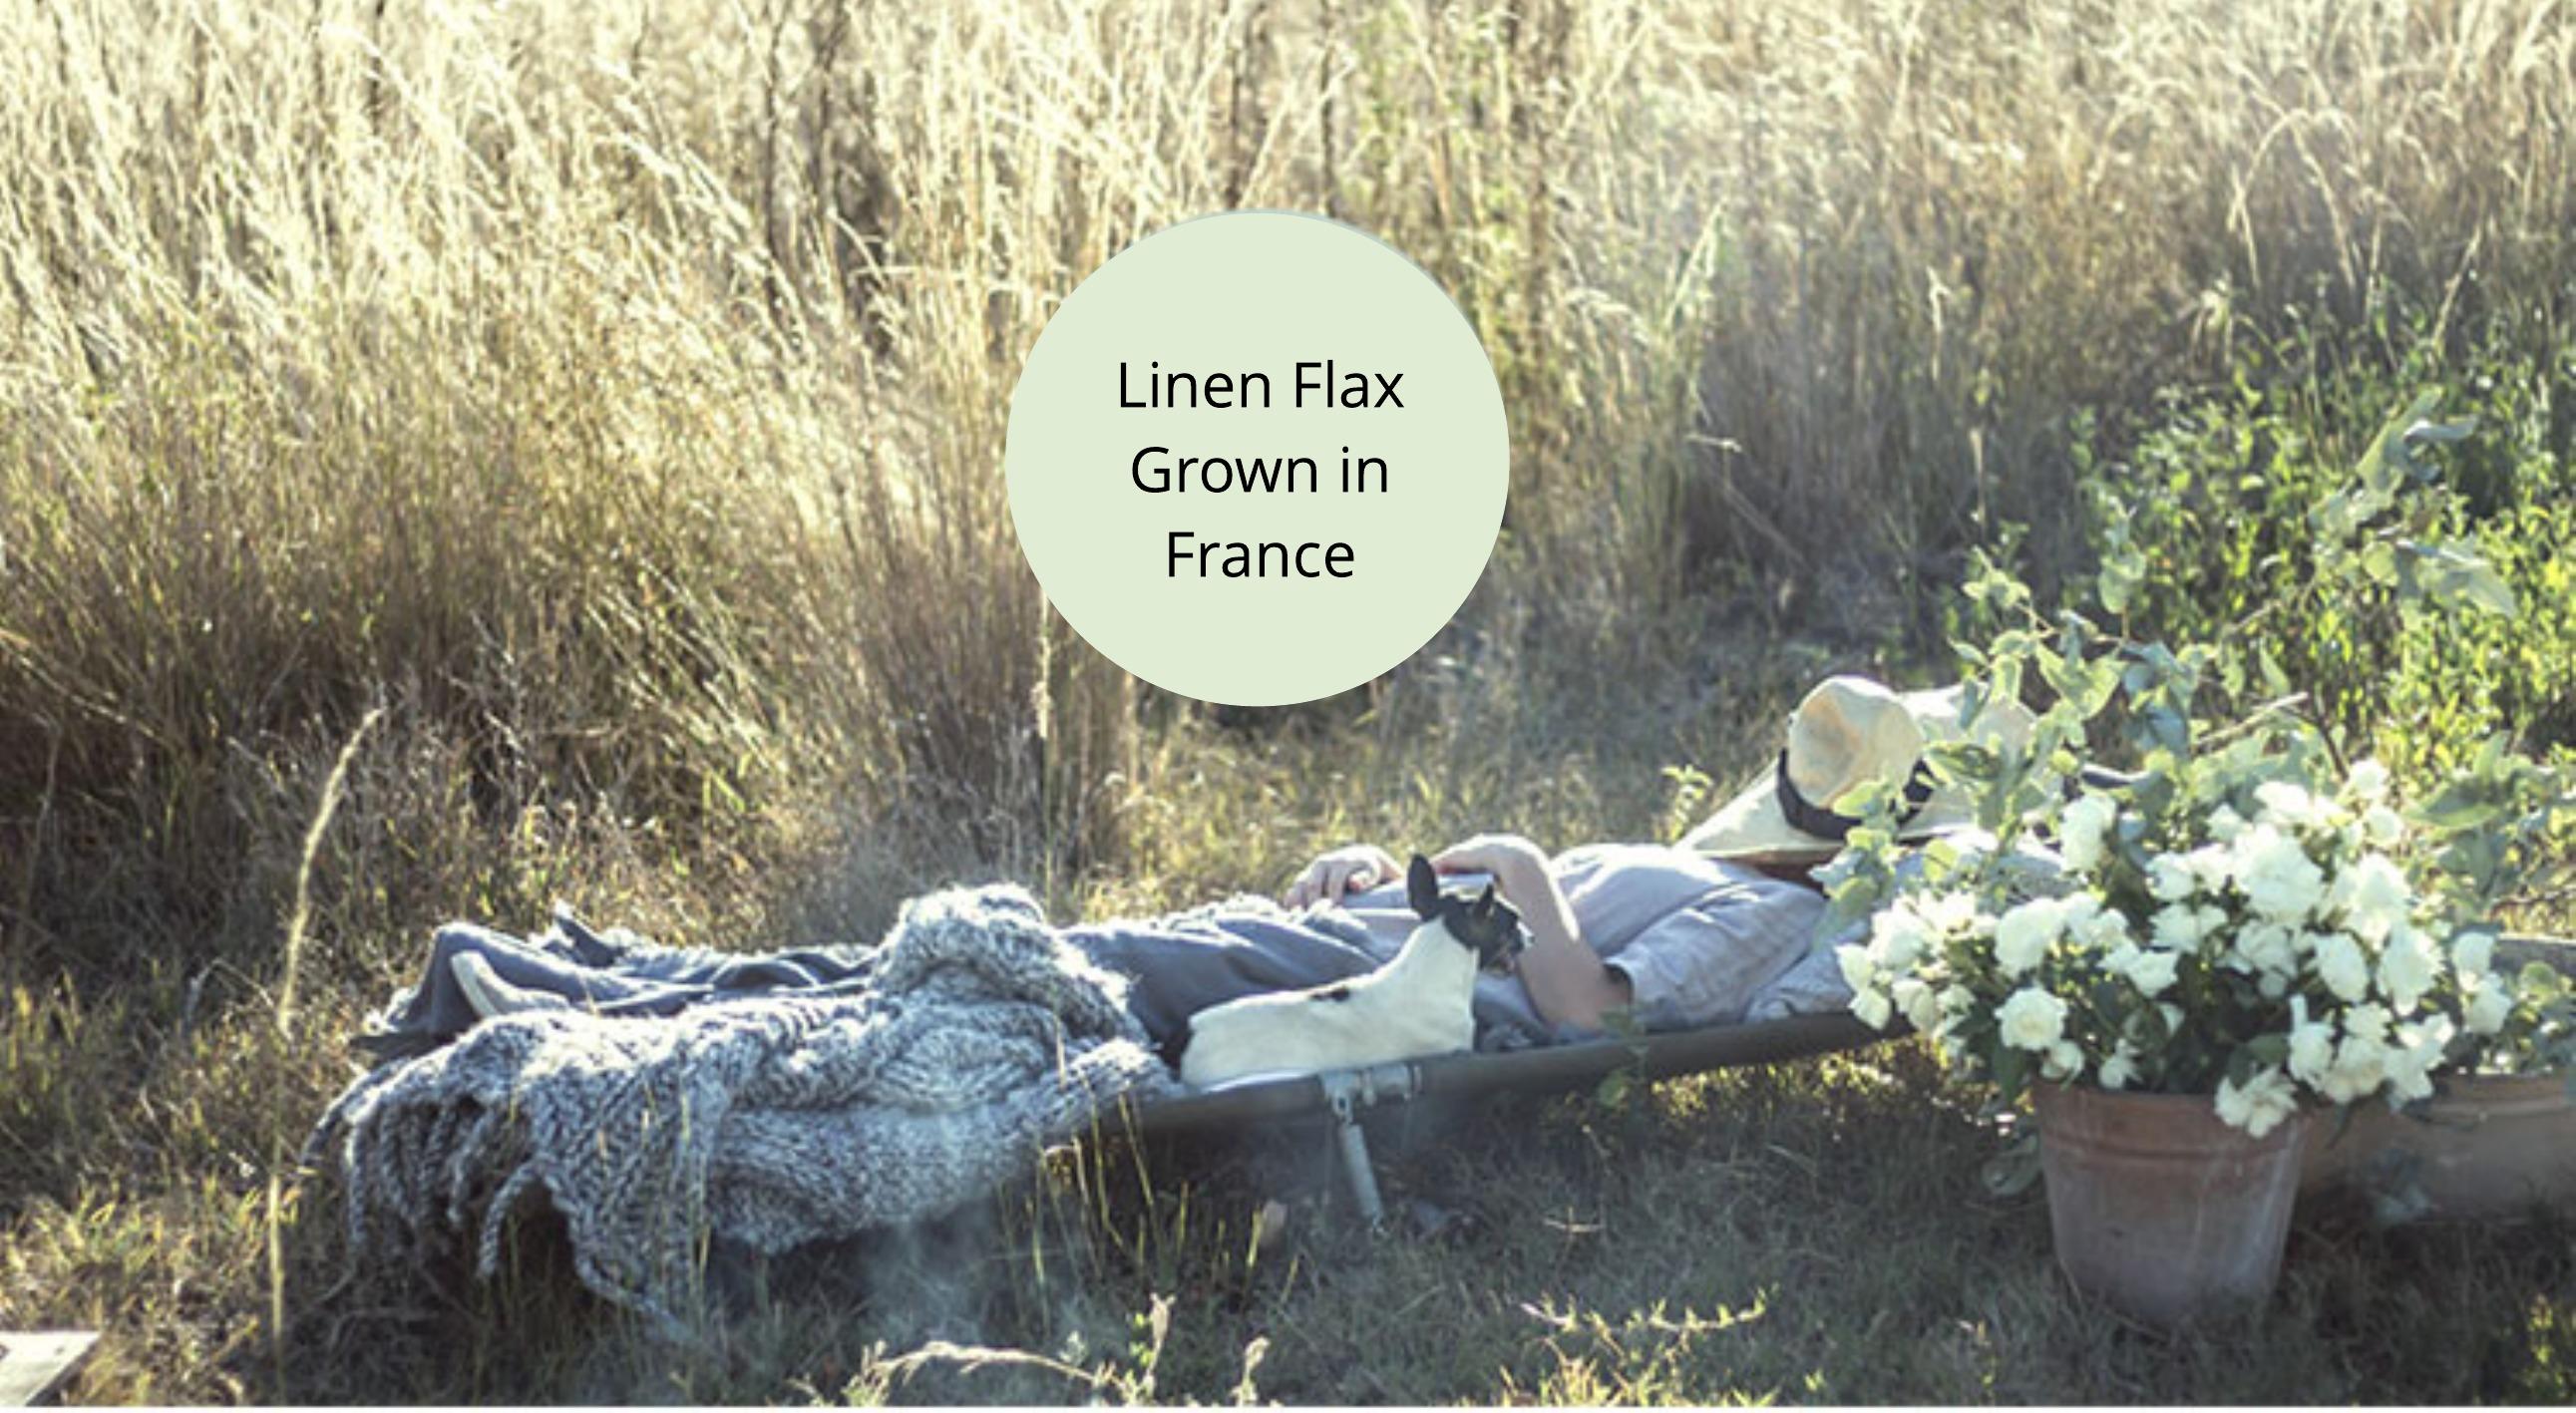 linen-flax-grown-in-france.jpeg